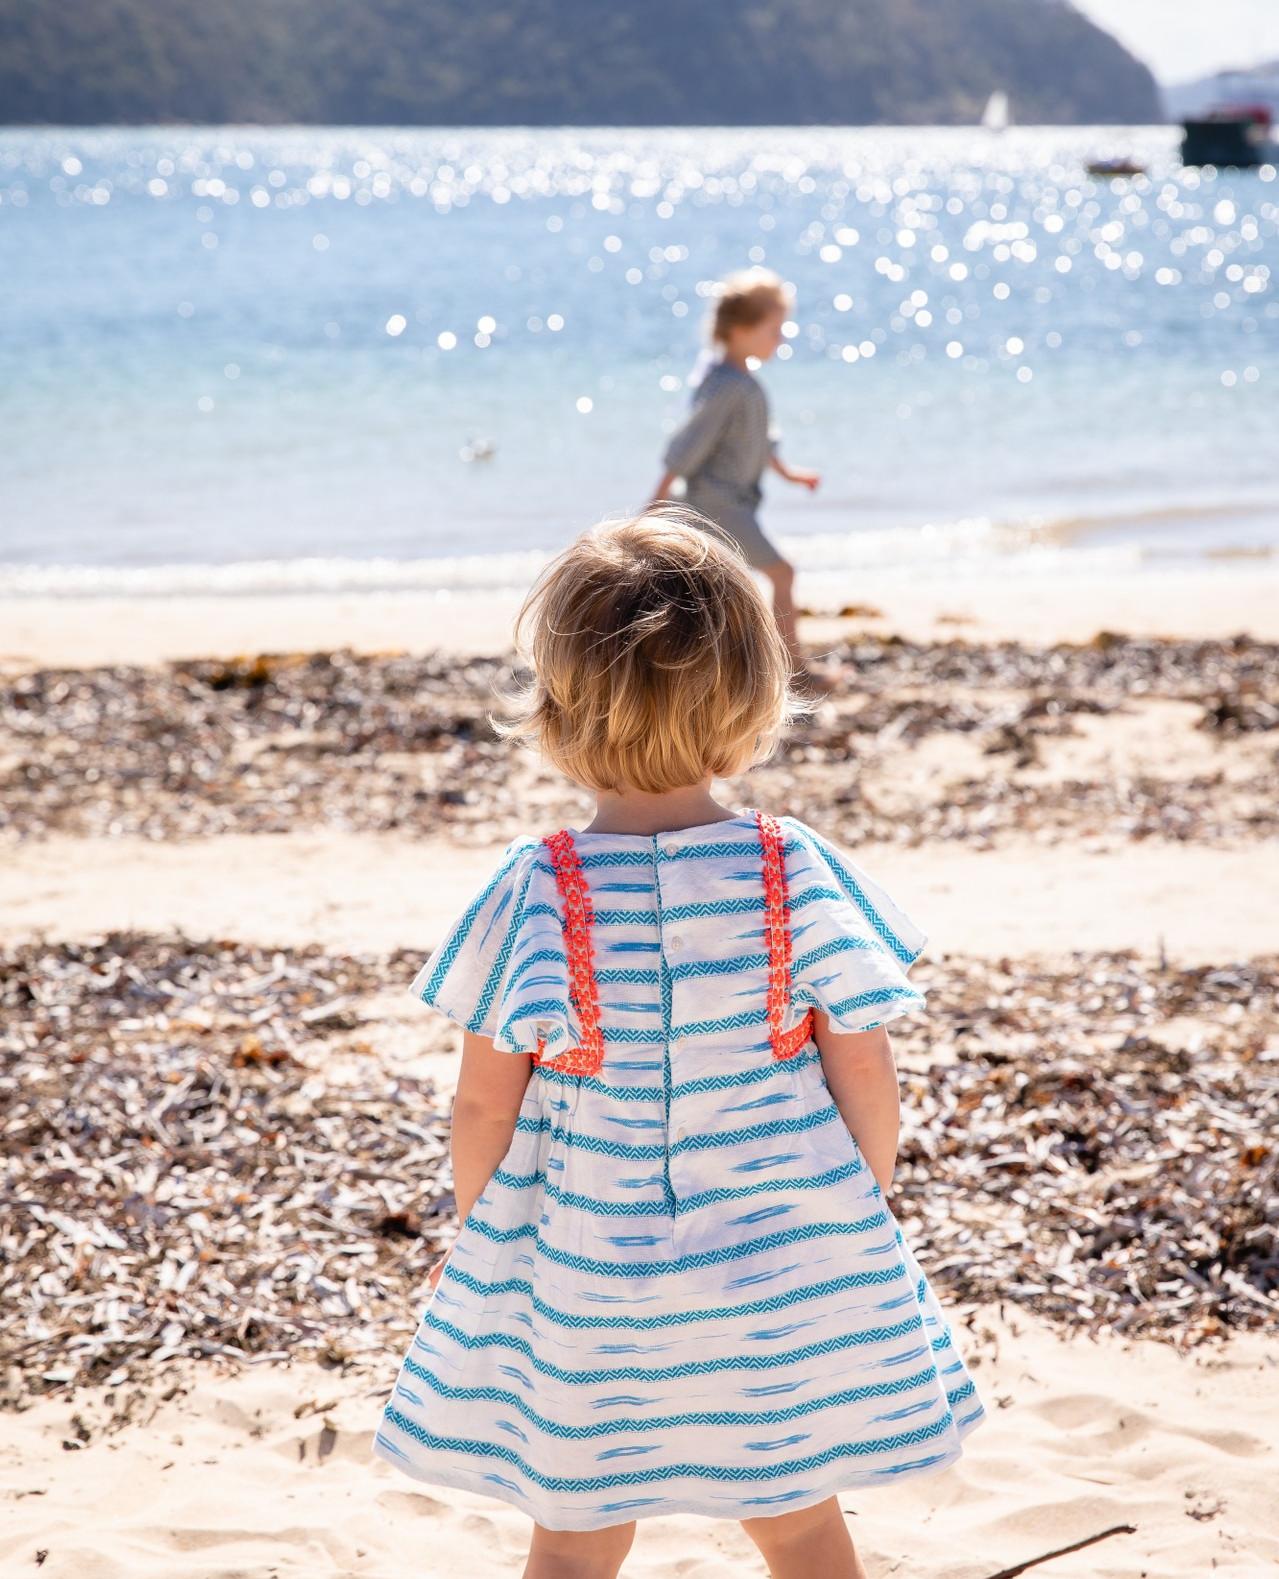 It's #sunawareness week 🌞so here's lots of helpful tips on protecting your baby in the sun by @totstotravel;        #livenaturally #scarletribbon #igmotherhood #letskeepitsimple #sustainableliving #Livethelittlethings #mumblogger #igmotherhood #mamahood #momentslikethese #happynow #mumpreneur #momsofig #momlife #igbaby #letthembelittle #toddler #toddlerlife  #mum_hub #worldoflittles